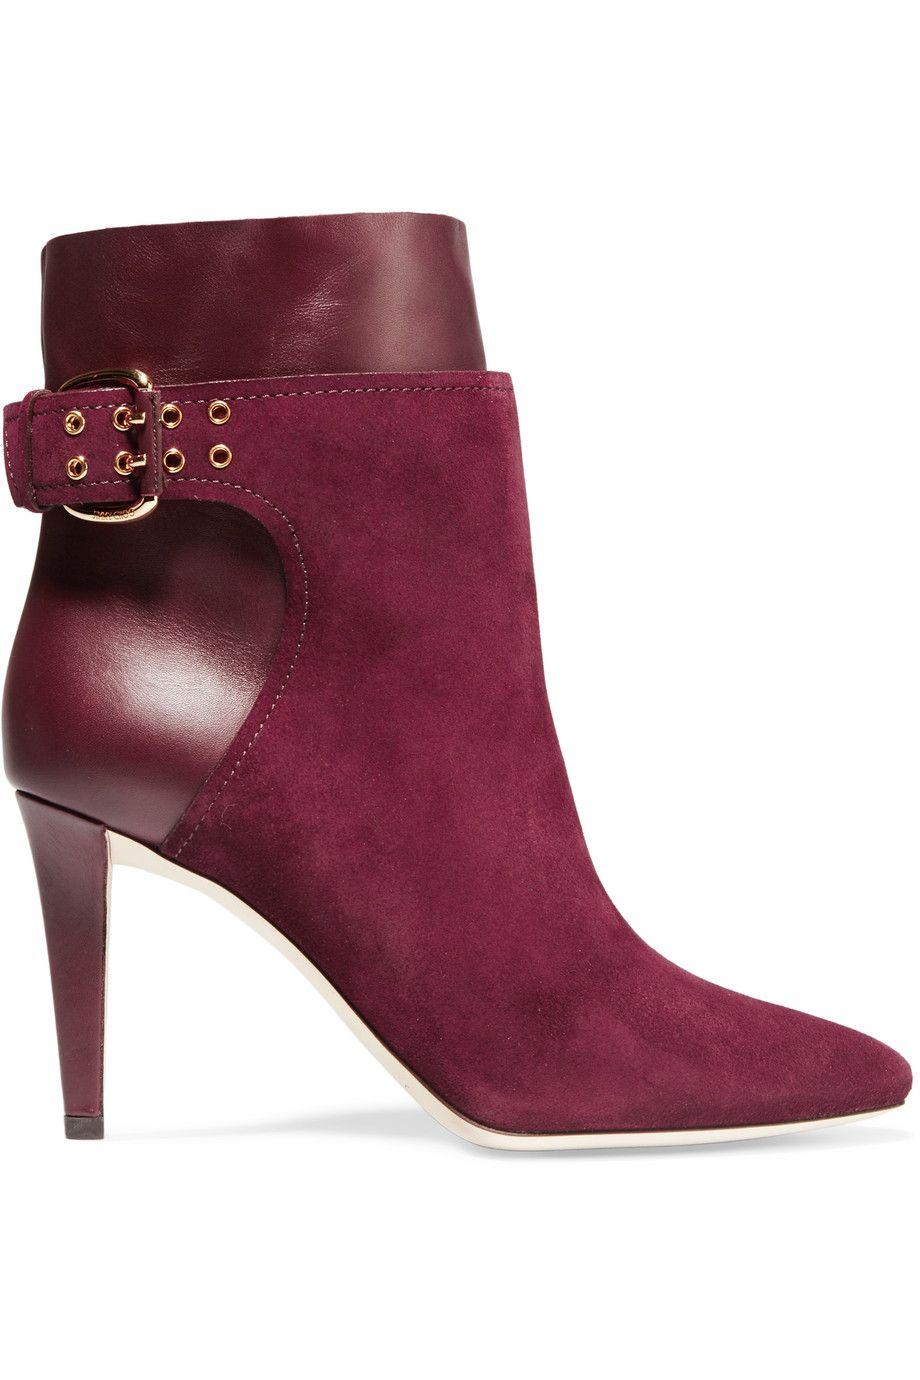 Jimmy Choo Suede Lasercut Ankle Boots explore online great deals cheap online iAn1y4L